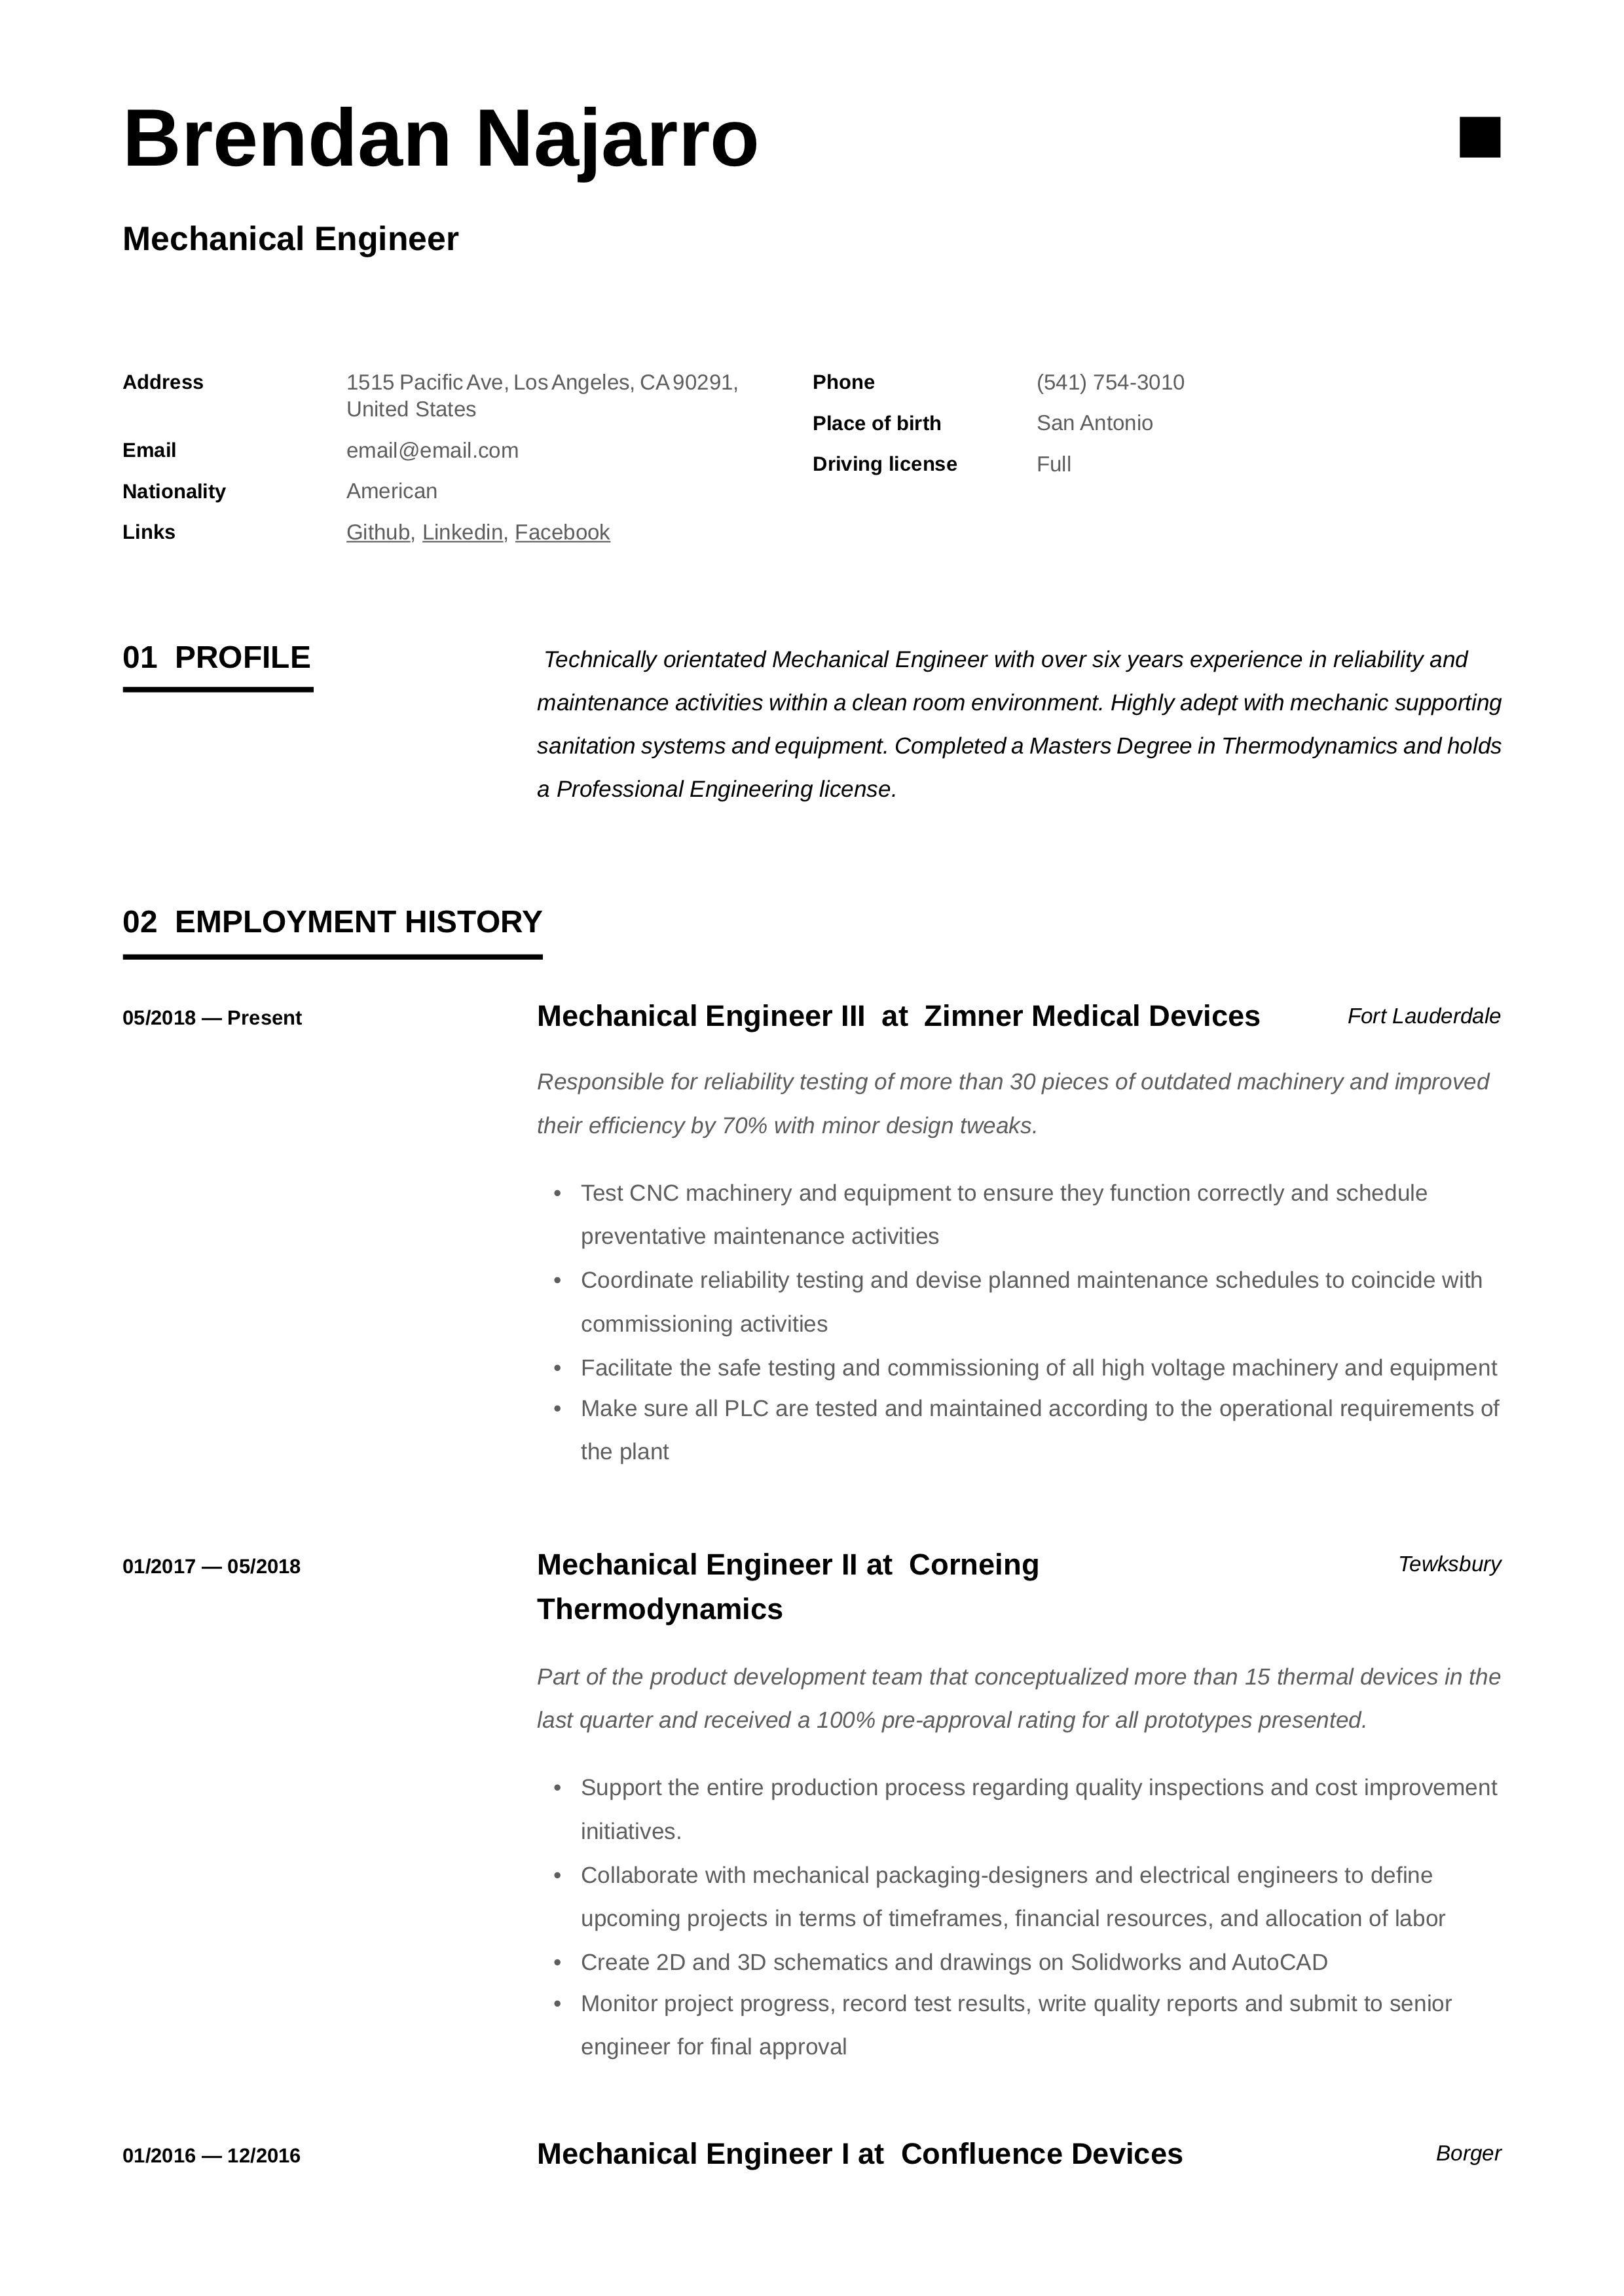 Mechanical Engineer Resume Template Engineering Resume Engineering Resume Templates Mechanical Engineer Resume